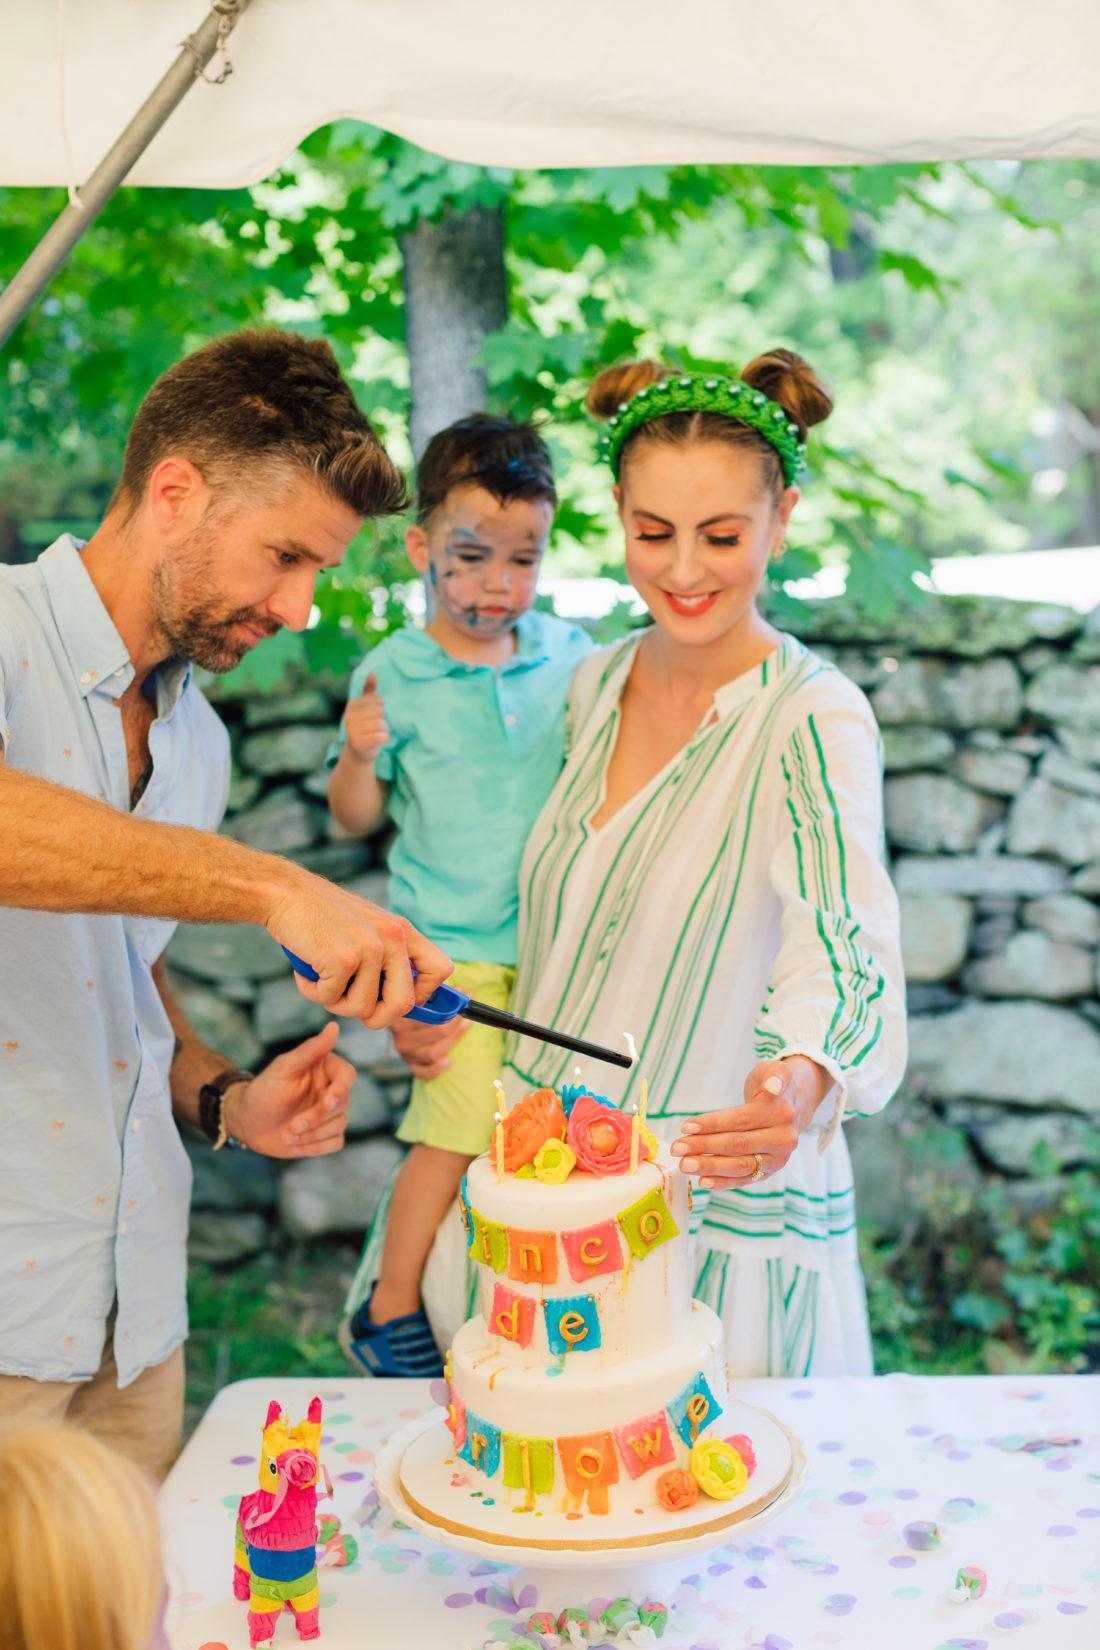 Kyle Martino lights daughter Marlowe's birthday cake at her Cinco de Marlowe themed 5th birthday fiesta